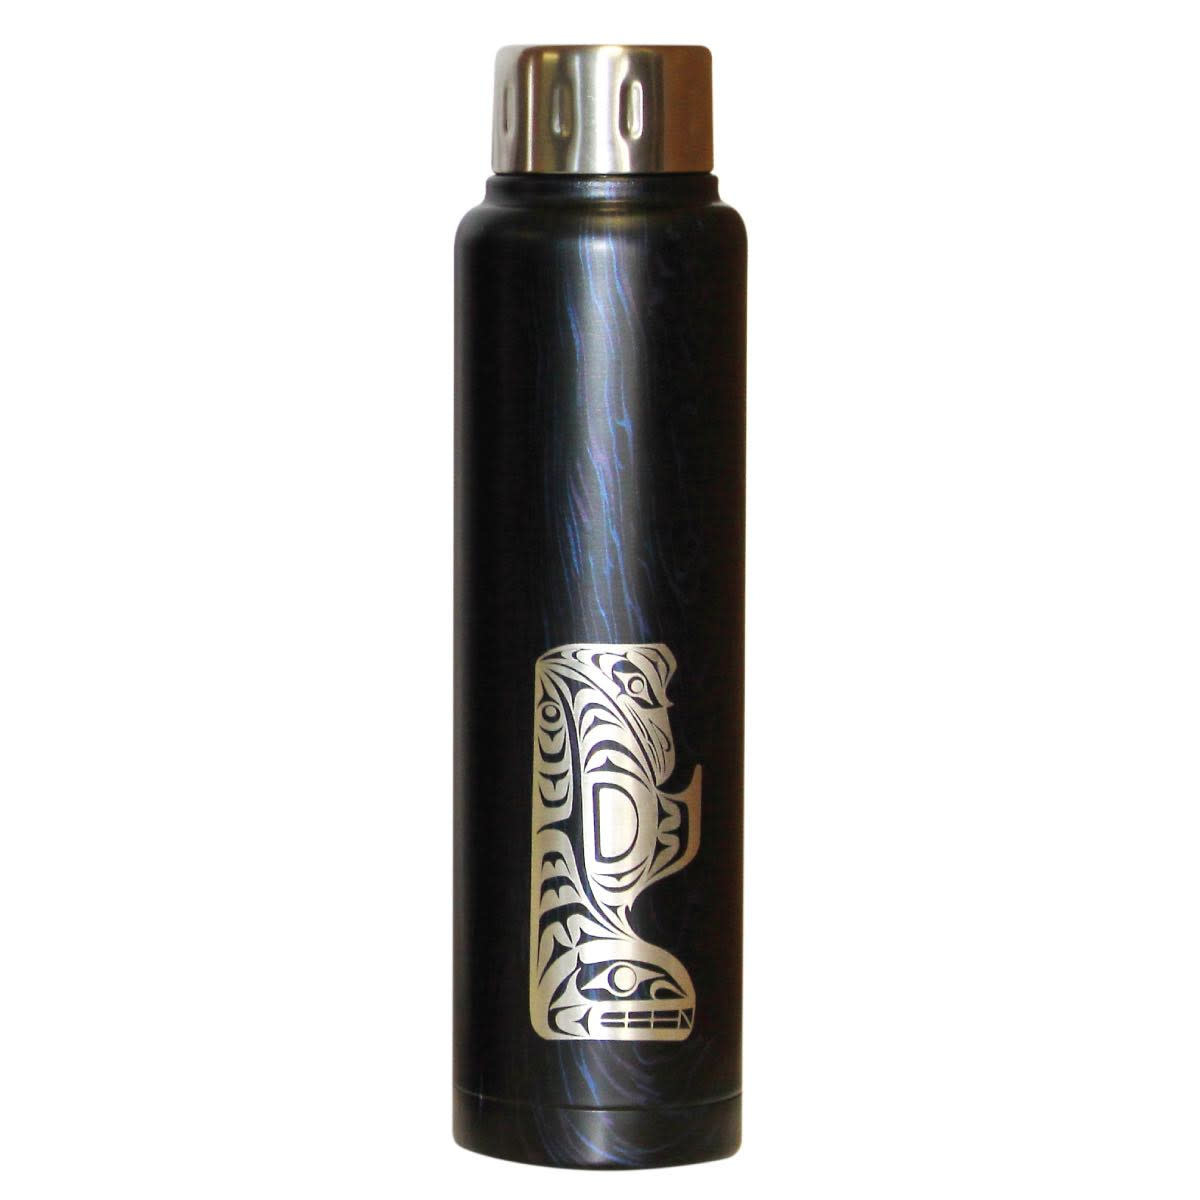 Thunderbird and Whale water bottle - Maynard Johnny Jr-1